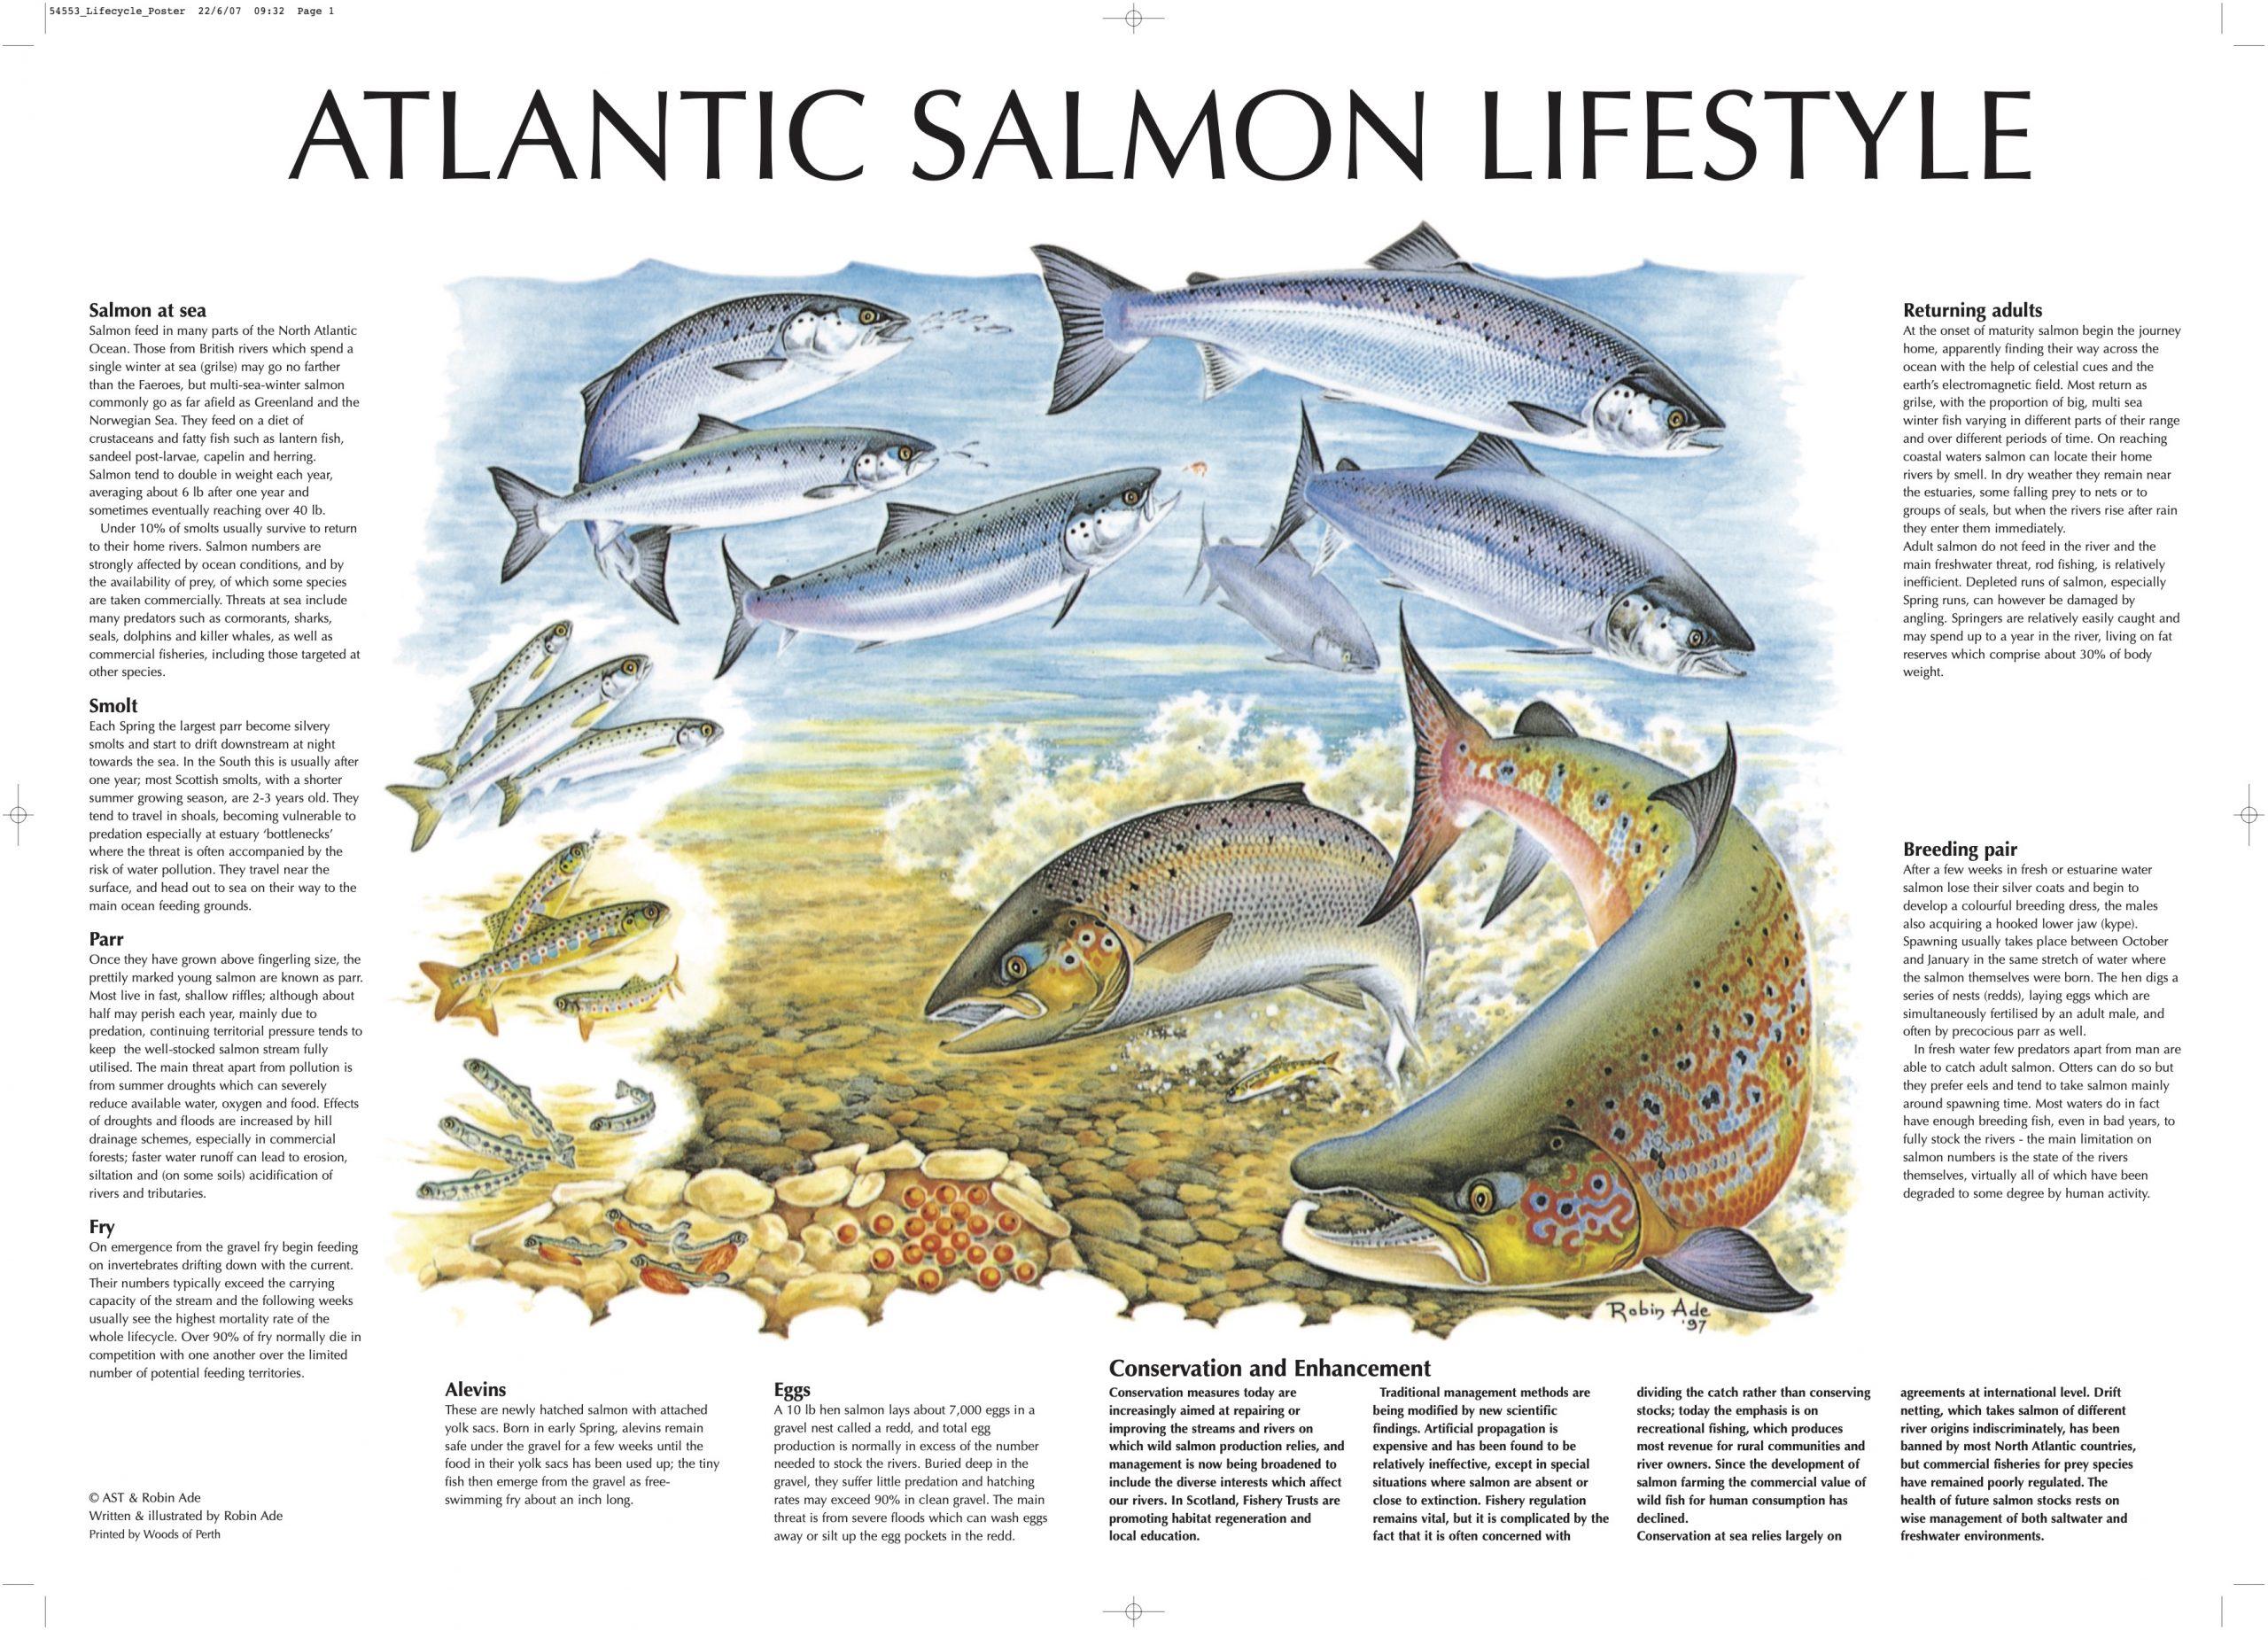 salmon-lifecycle1-1